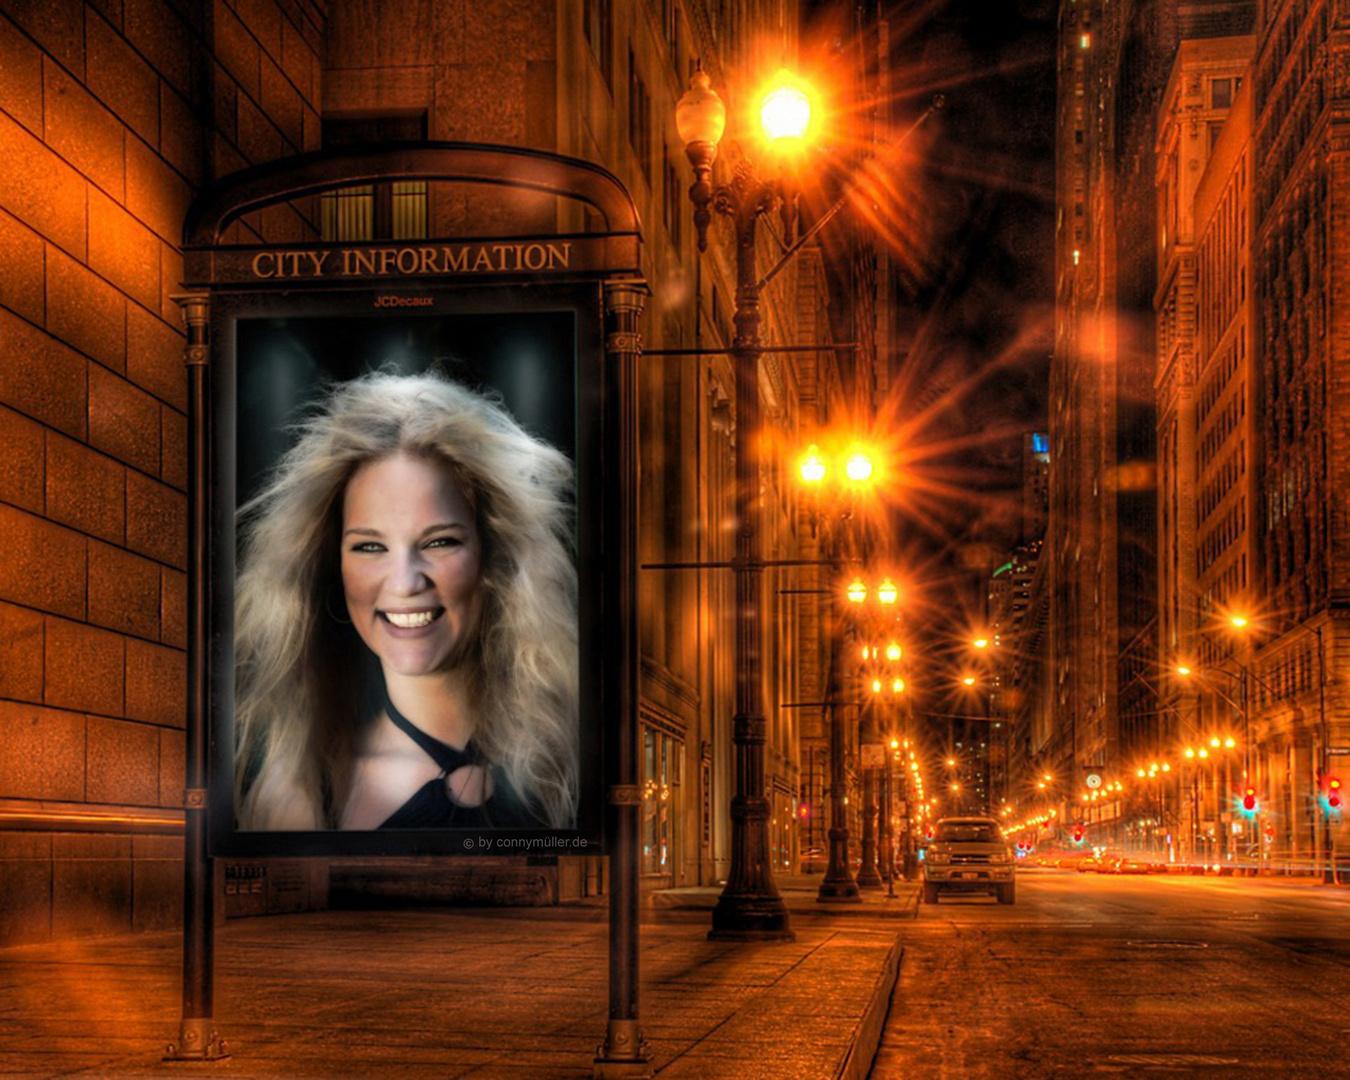 On Broadway Foto & Bild | experimente, rahmen, model w Bilder auf ...